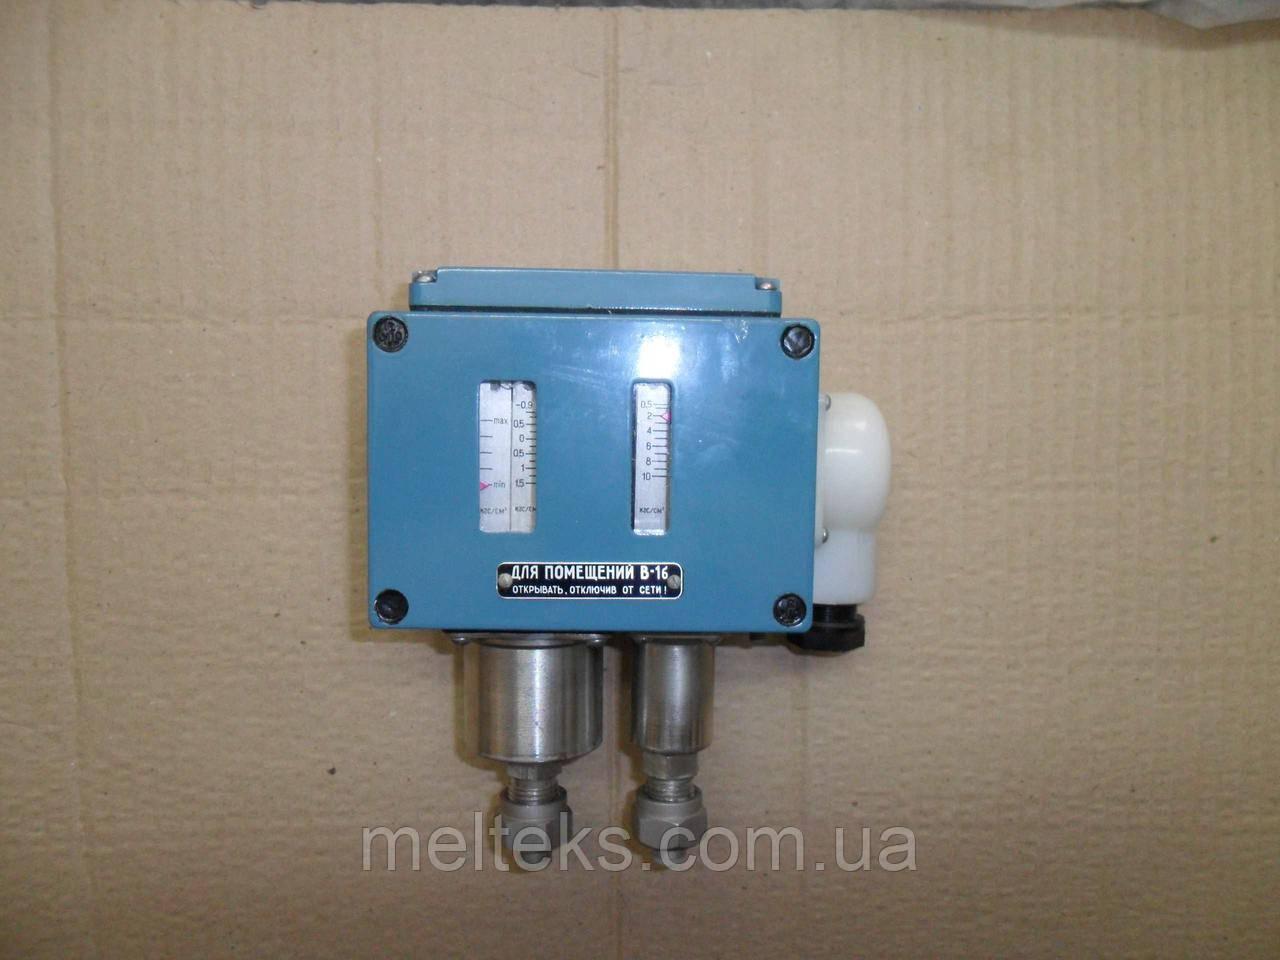 Реле давления аммиачное Д220А-13, Д220А-12